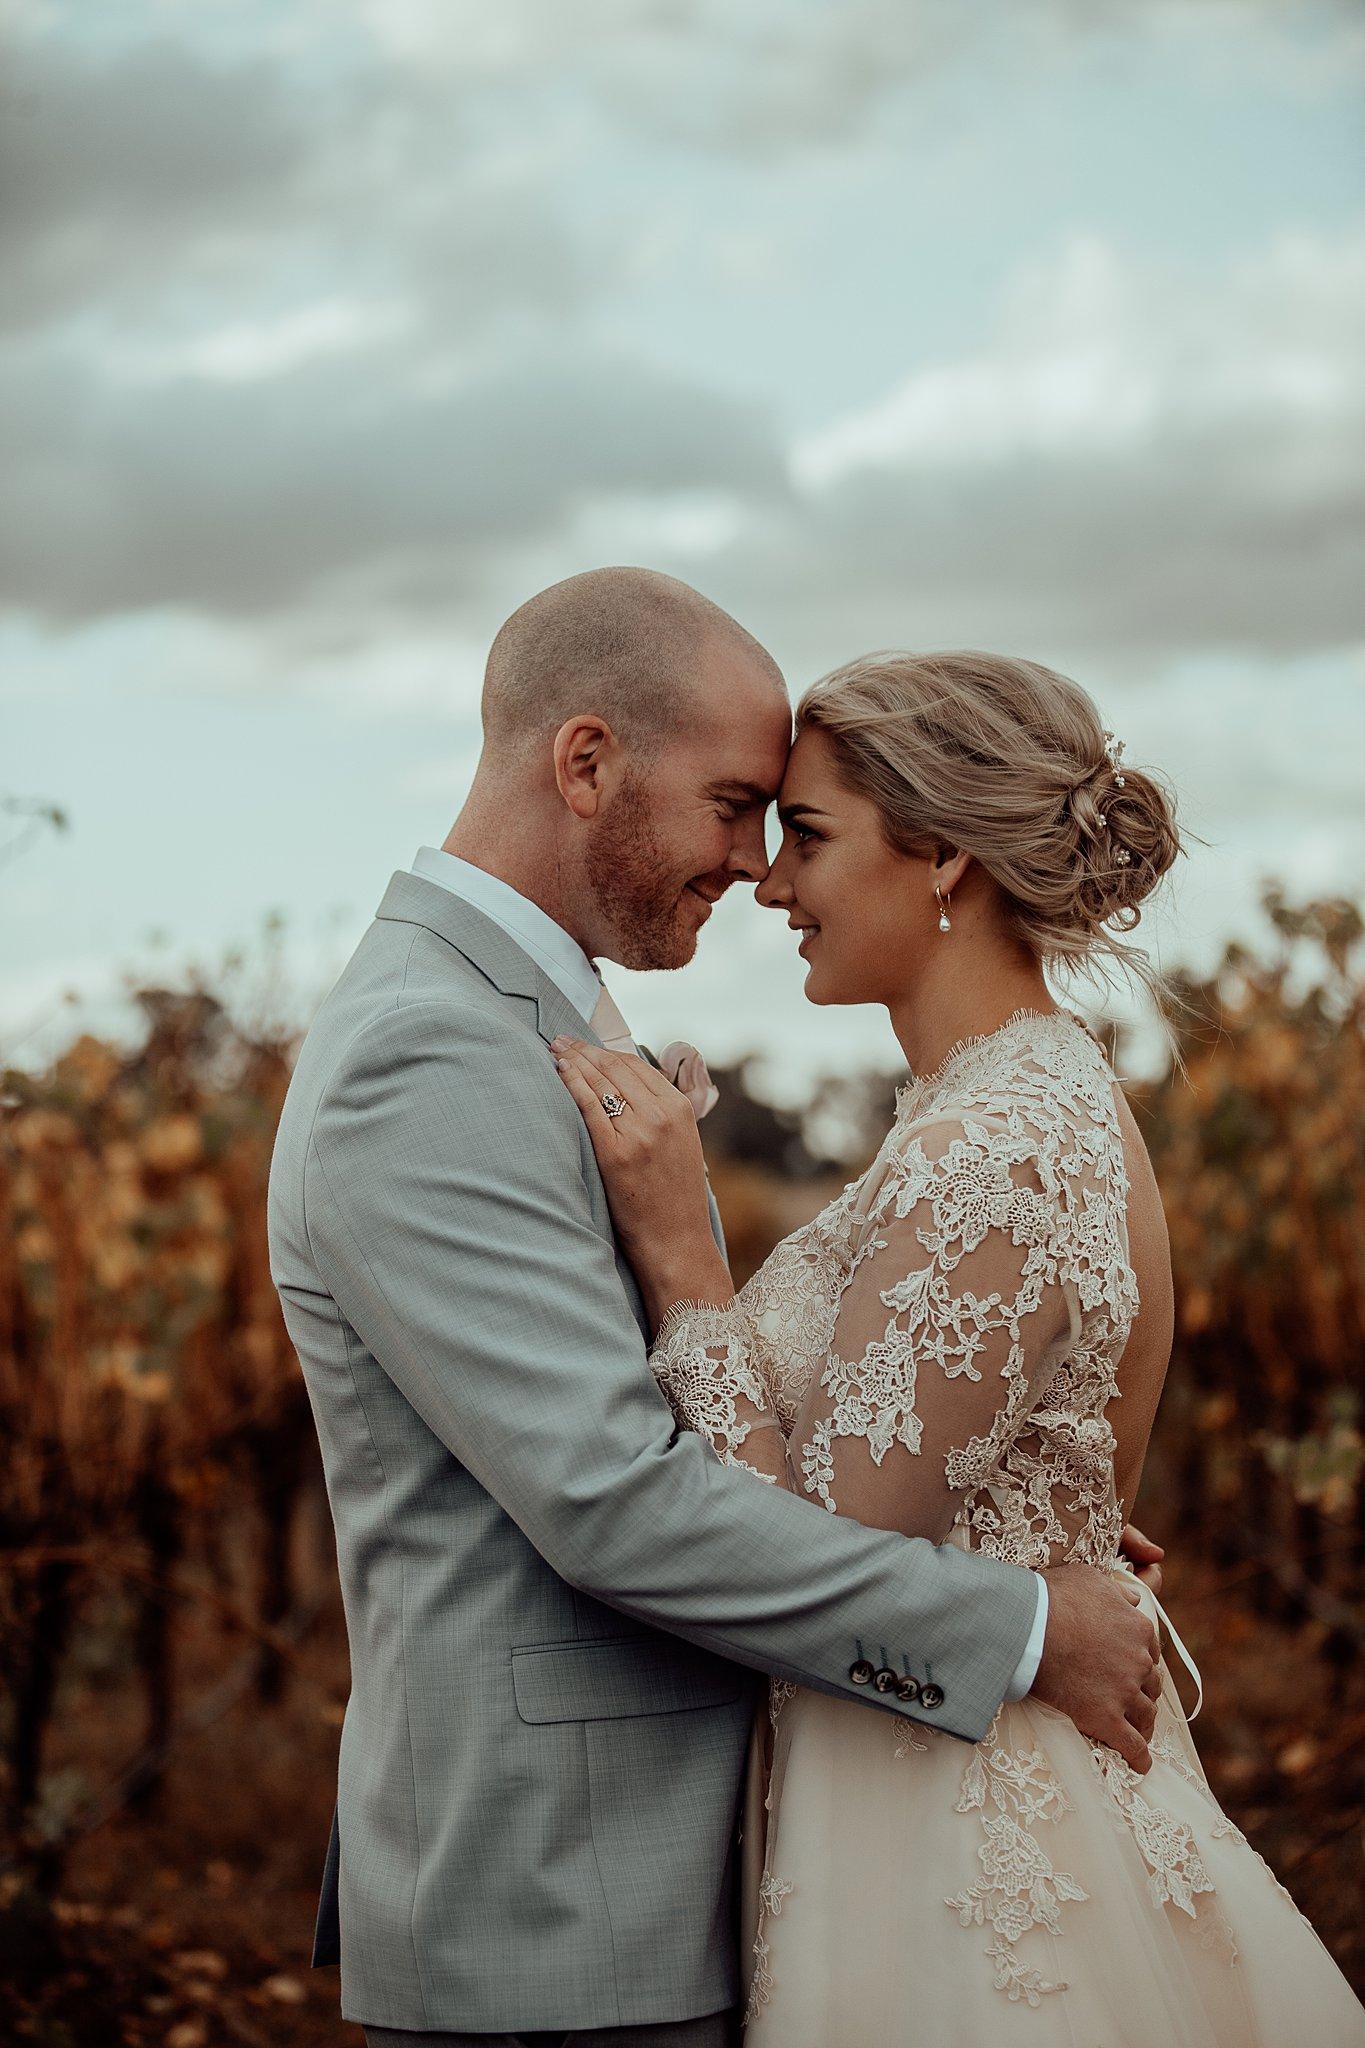 mickalathomas_puremacphotography_weddingphotographer_couplephotographer_Sheppartonphotographer_3453.jpg